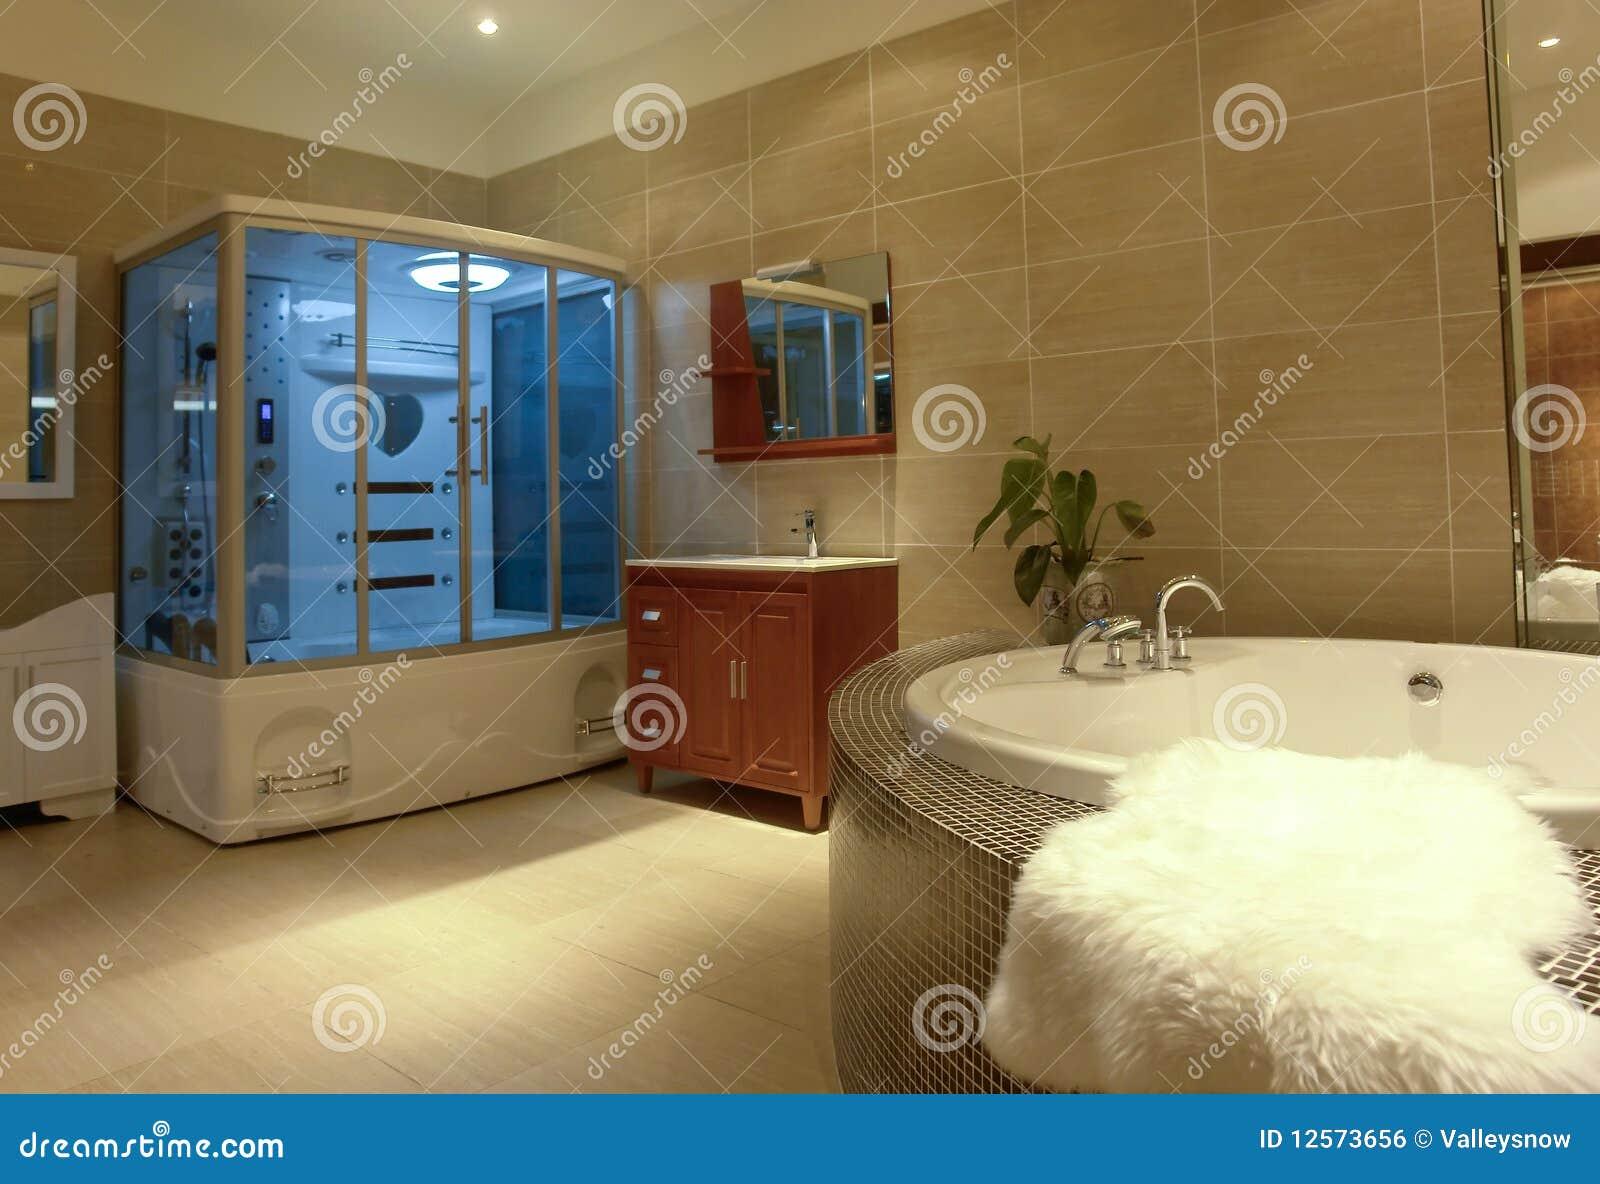 Stanza da bagno di lusso immagine stock libera da diritti - Asciugamani bagno di lusso ...